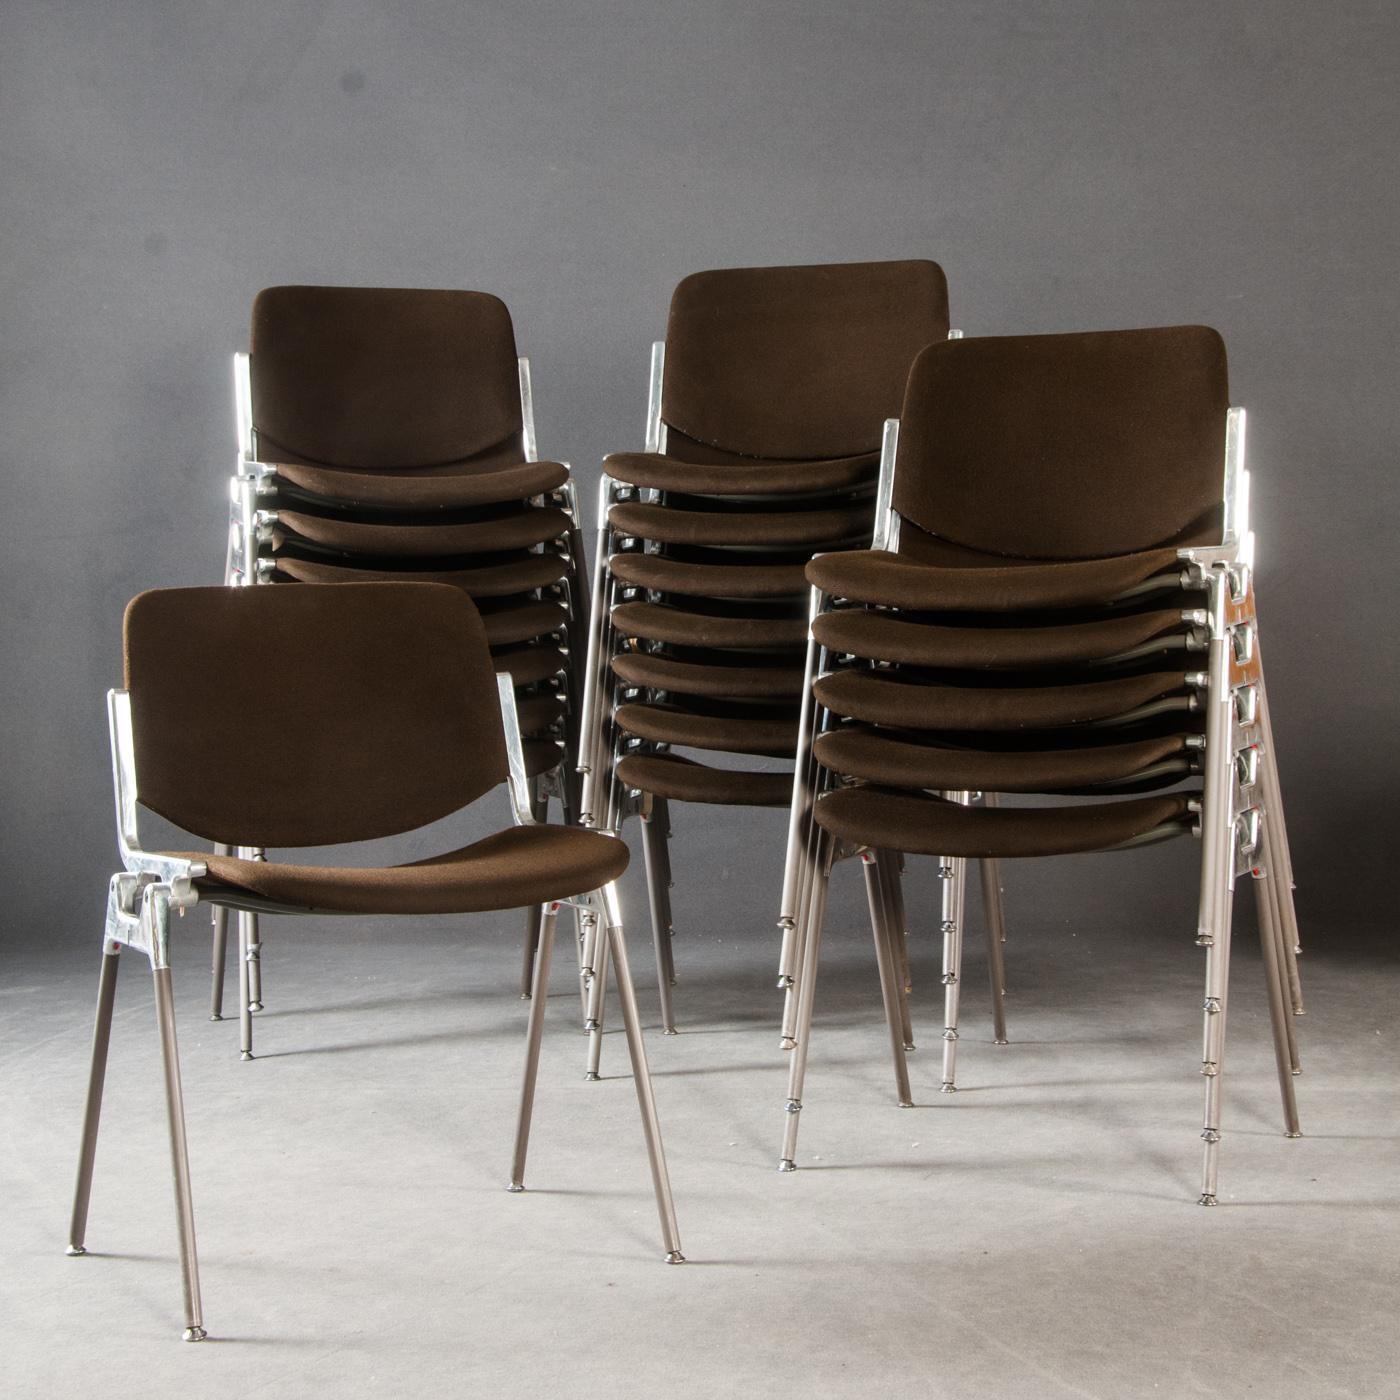 wartezimmer sthle perfect castelli italy sthle stuhl wartezimmer castelli piretti with. Black Bedroom Furniture Sets. Home Design Ideas